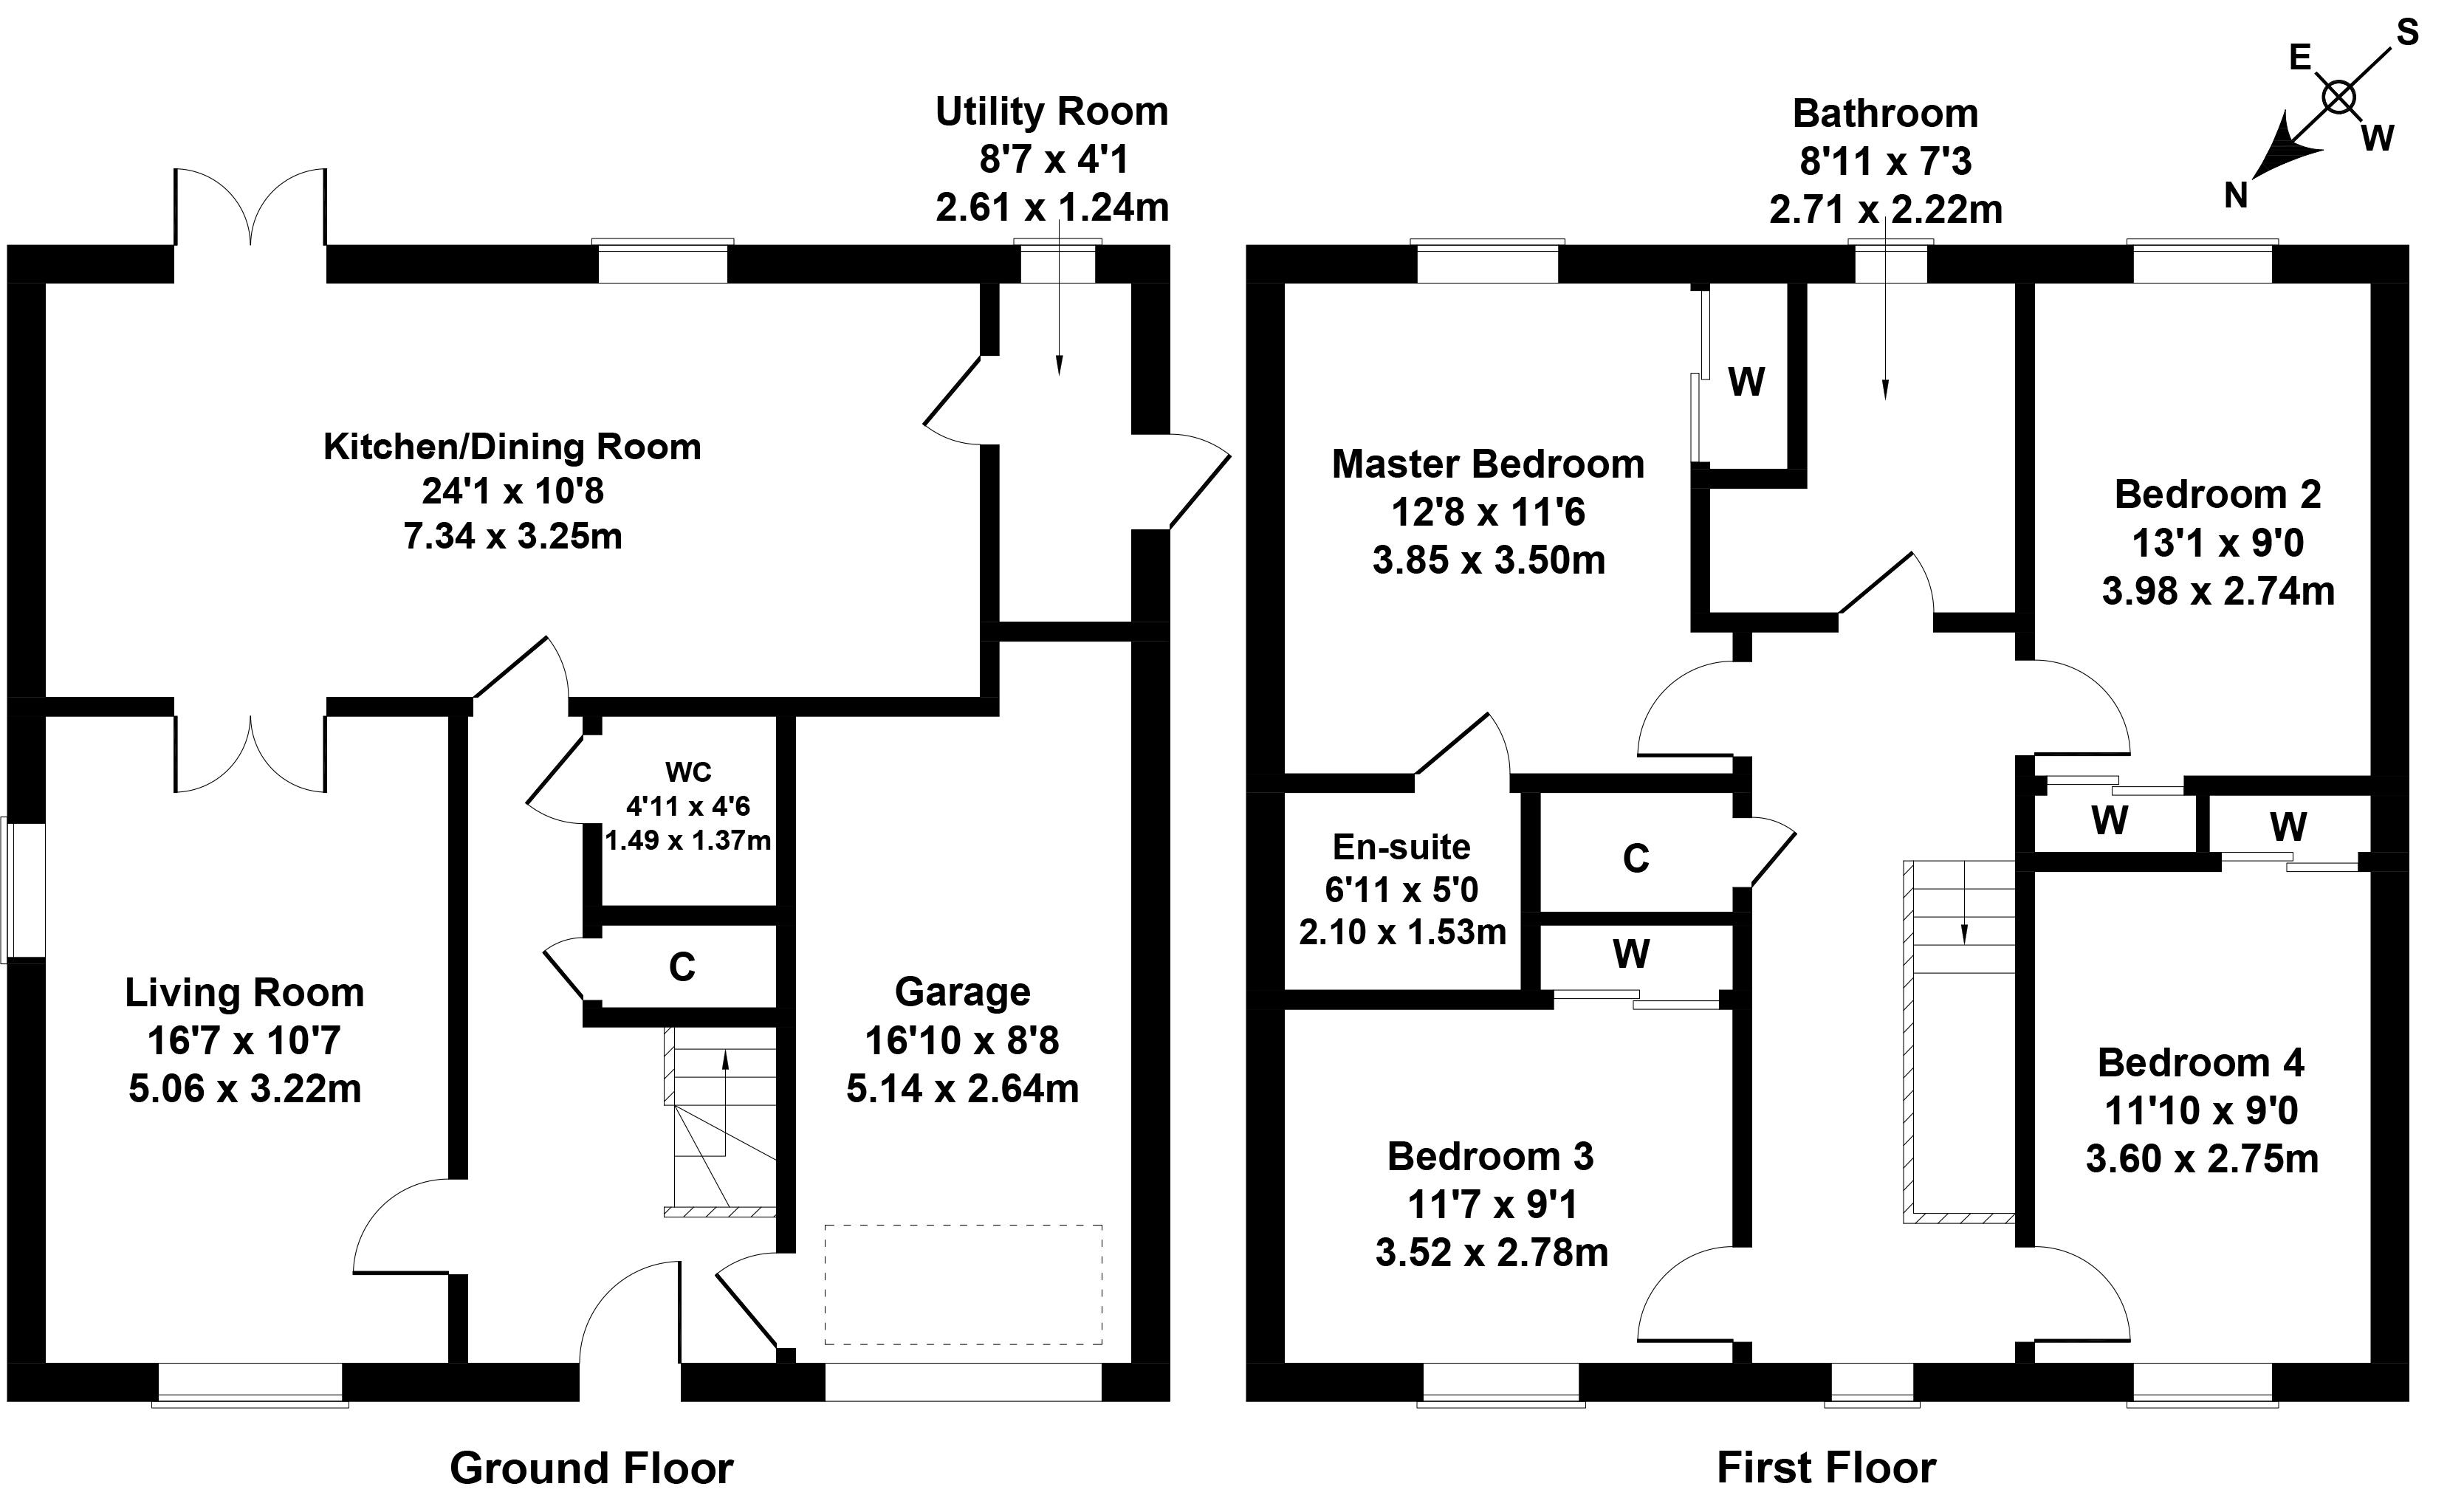 Floorplan 1 of 1 Thorny Crook Loan, Dalkeith, Midlothian, EH22 2RL